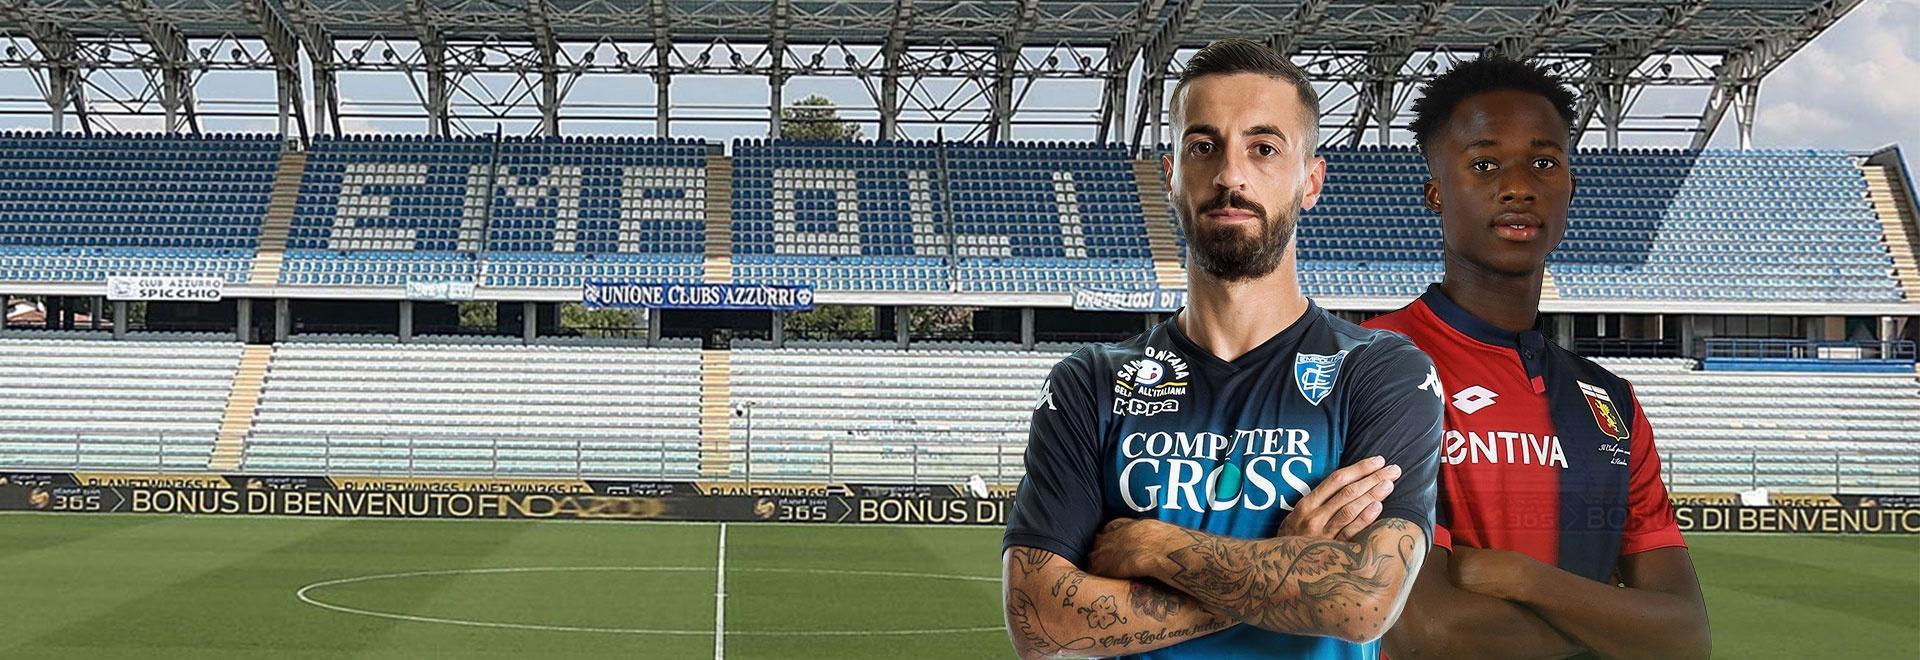 Empoli - Genoa